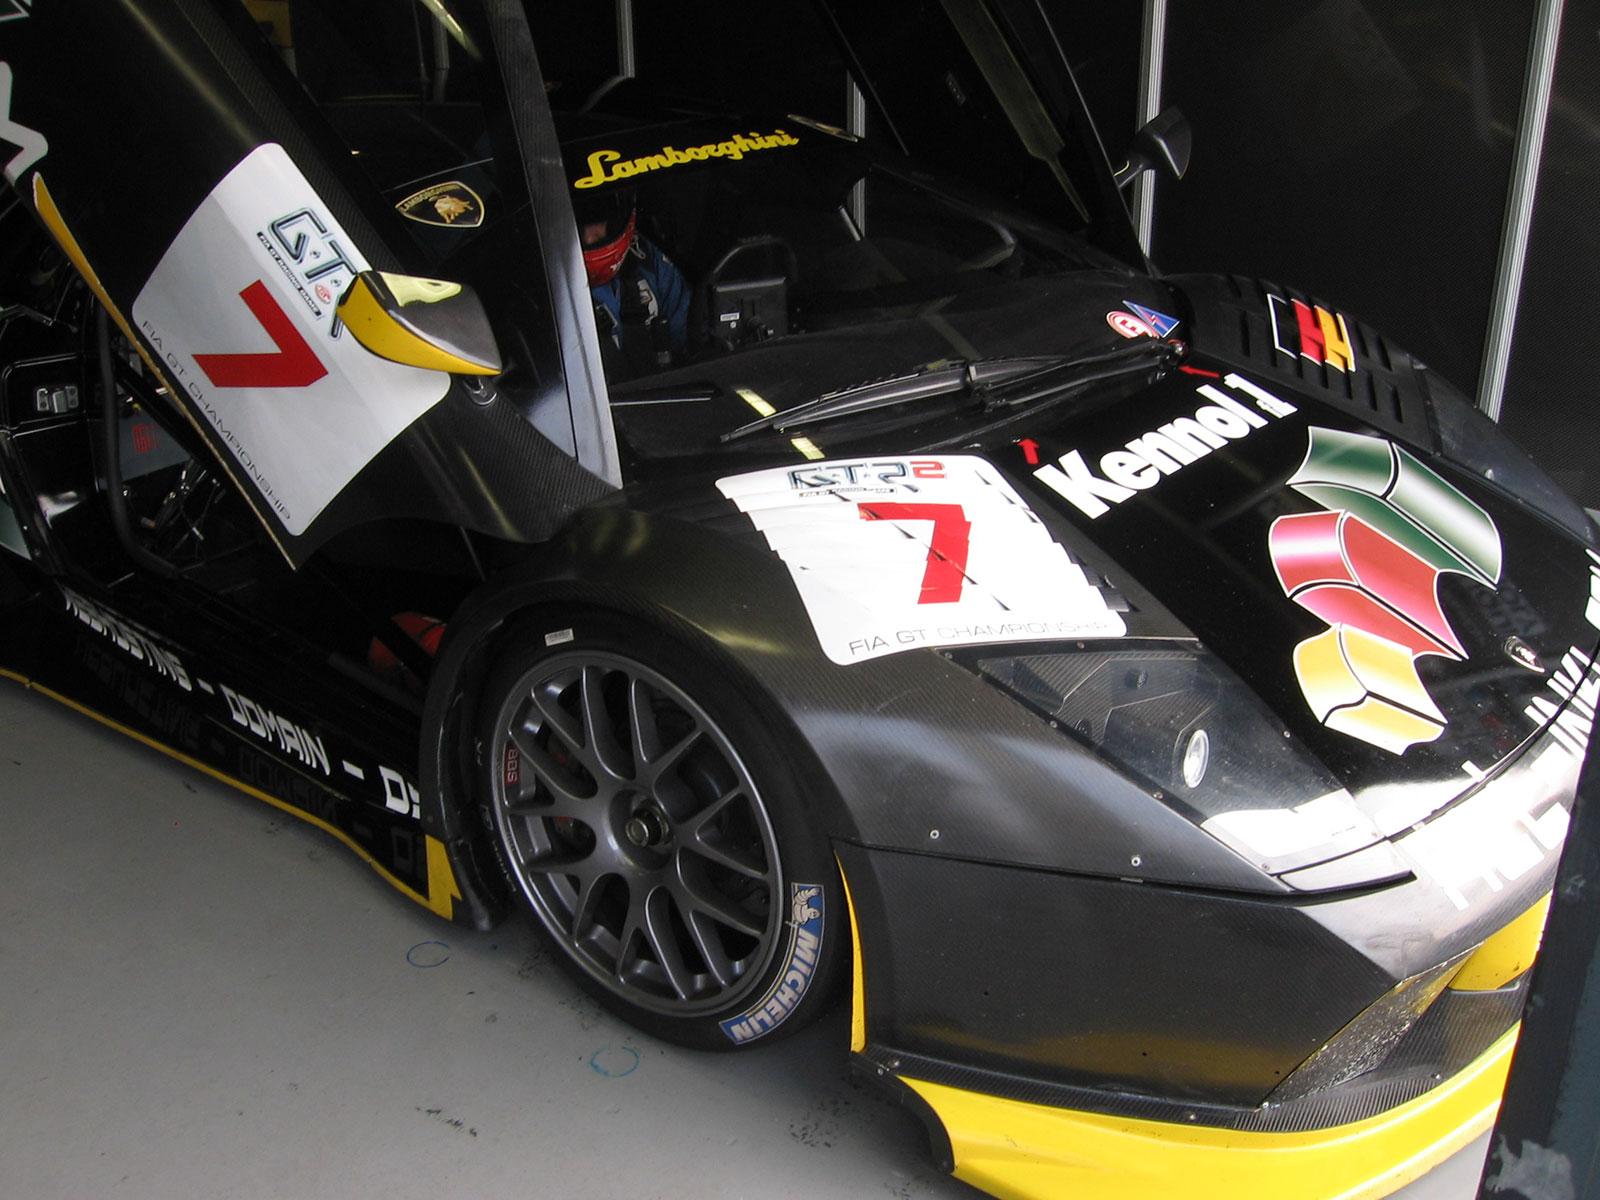 Lamborghini-R-GT-low